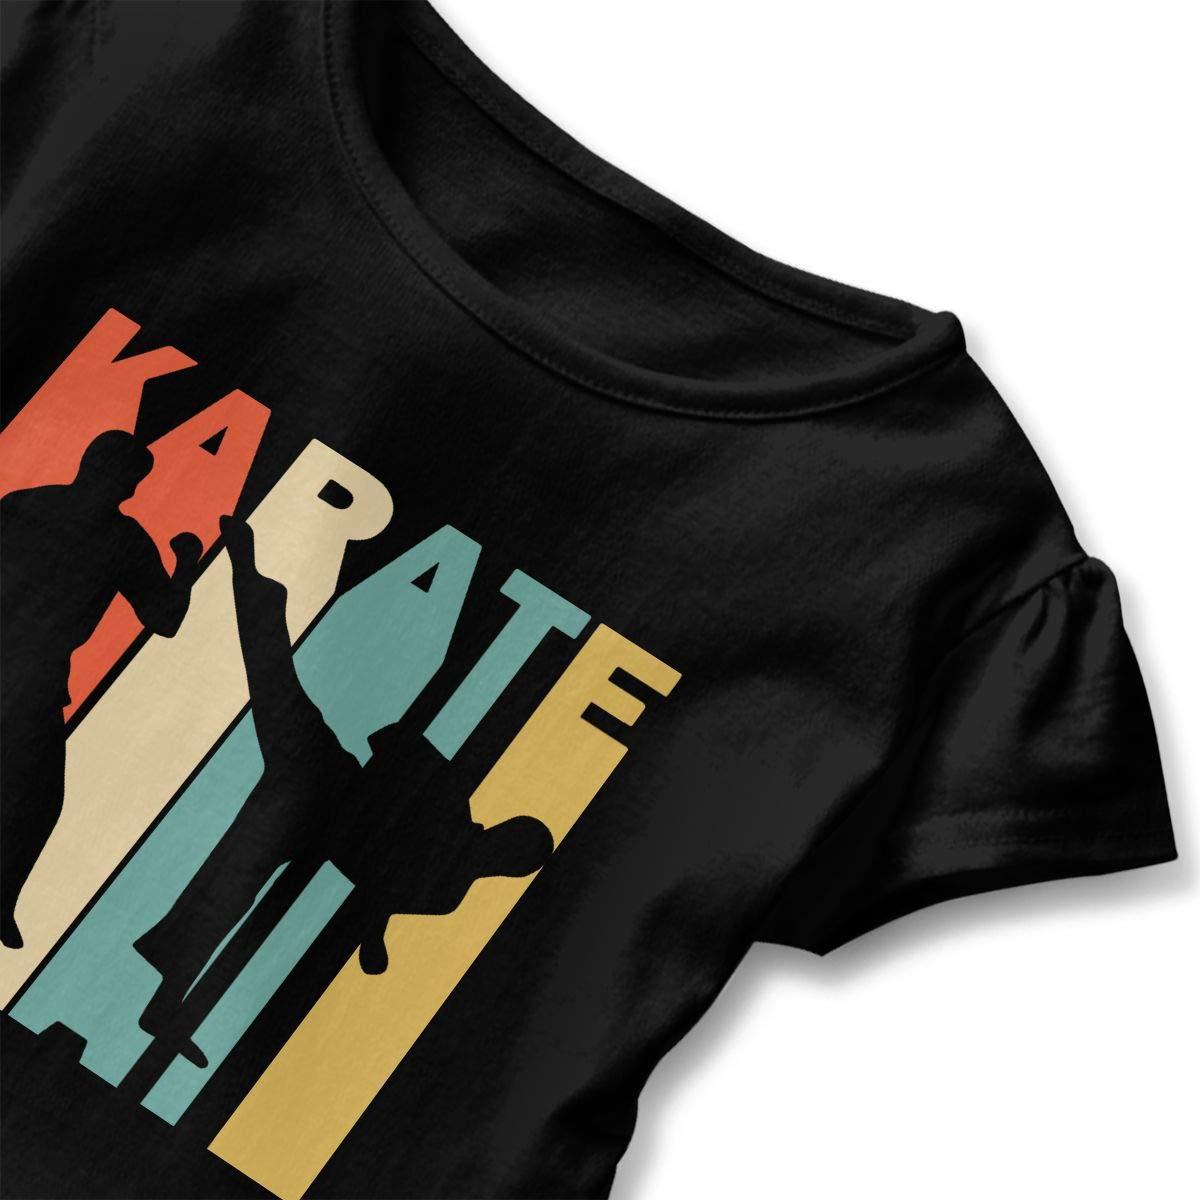 Kawaii Sweatshirt with Falbala Short-Sleeve Retro Style Karate Silhouette Shirts for Kids 2-6T